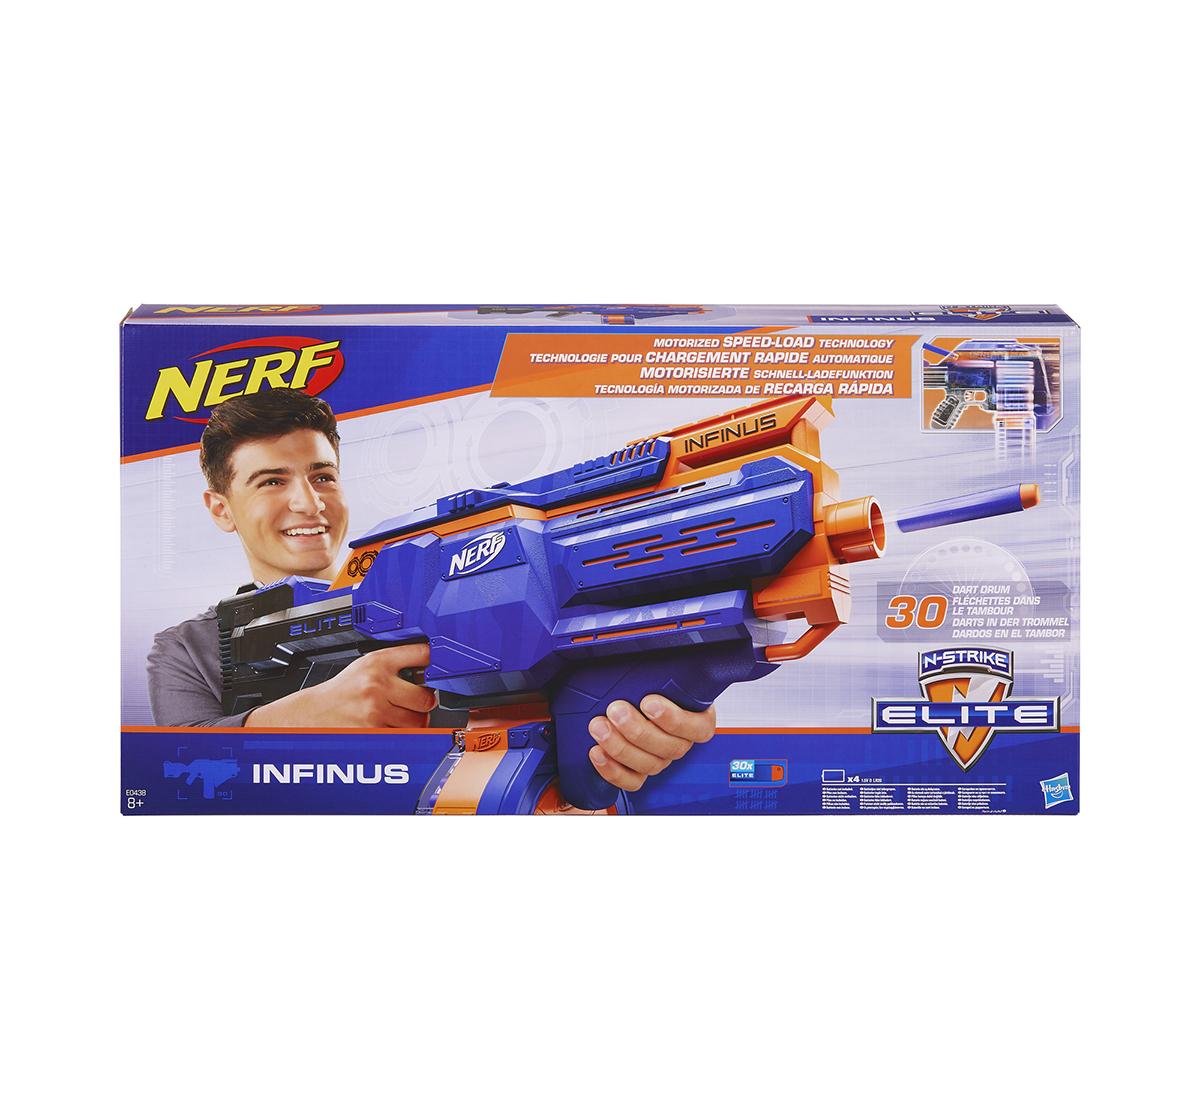 Nerf | Nerf Infinus Blasters for Boys age 8Y+